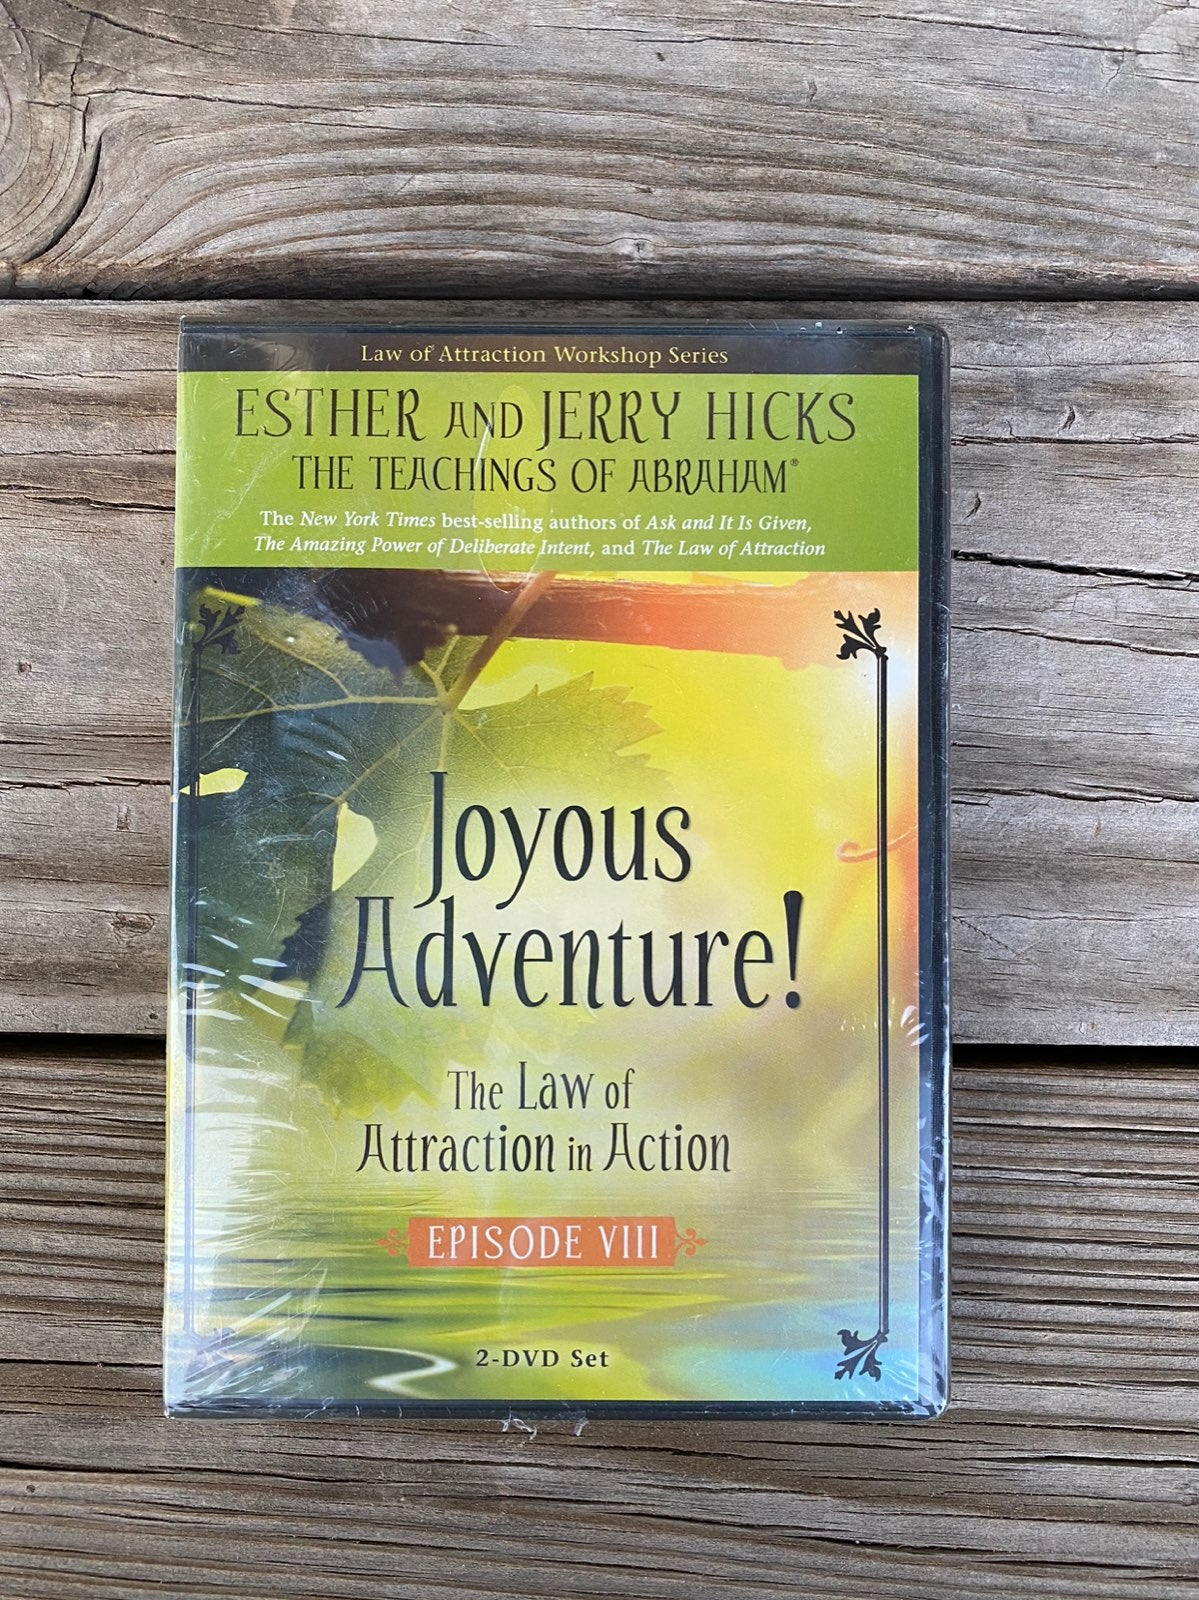 Joyous Adventure by Esther & Jerry Hicks